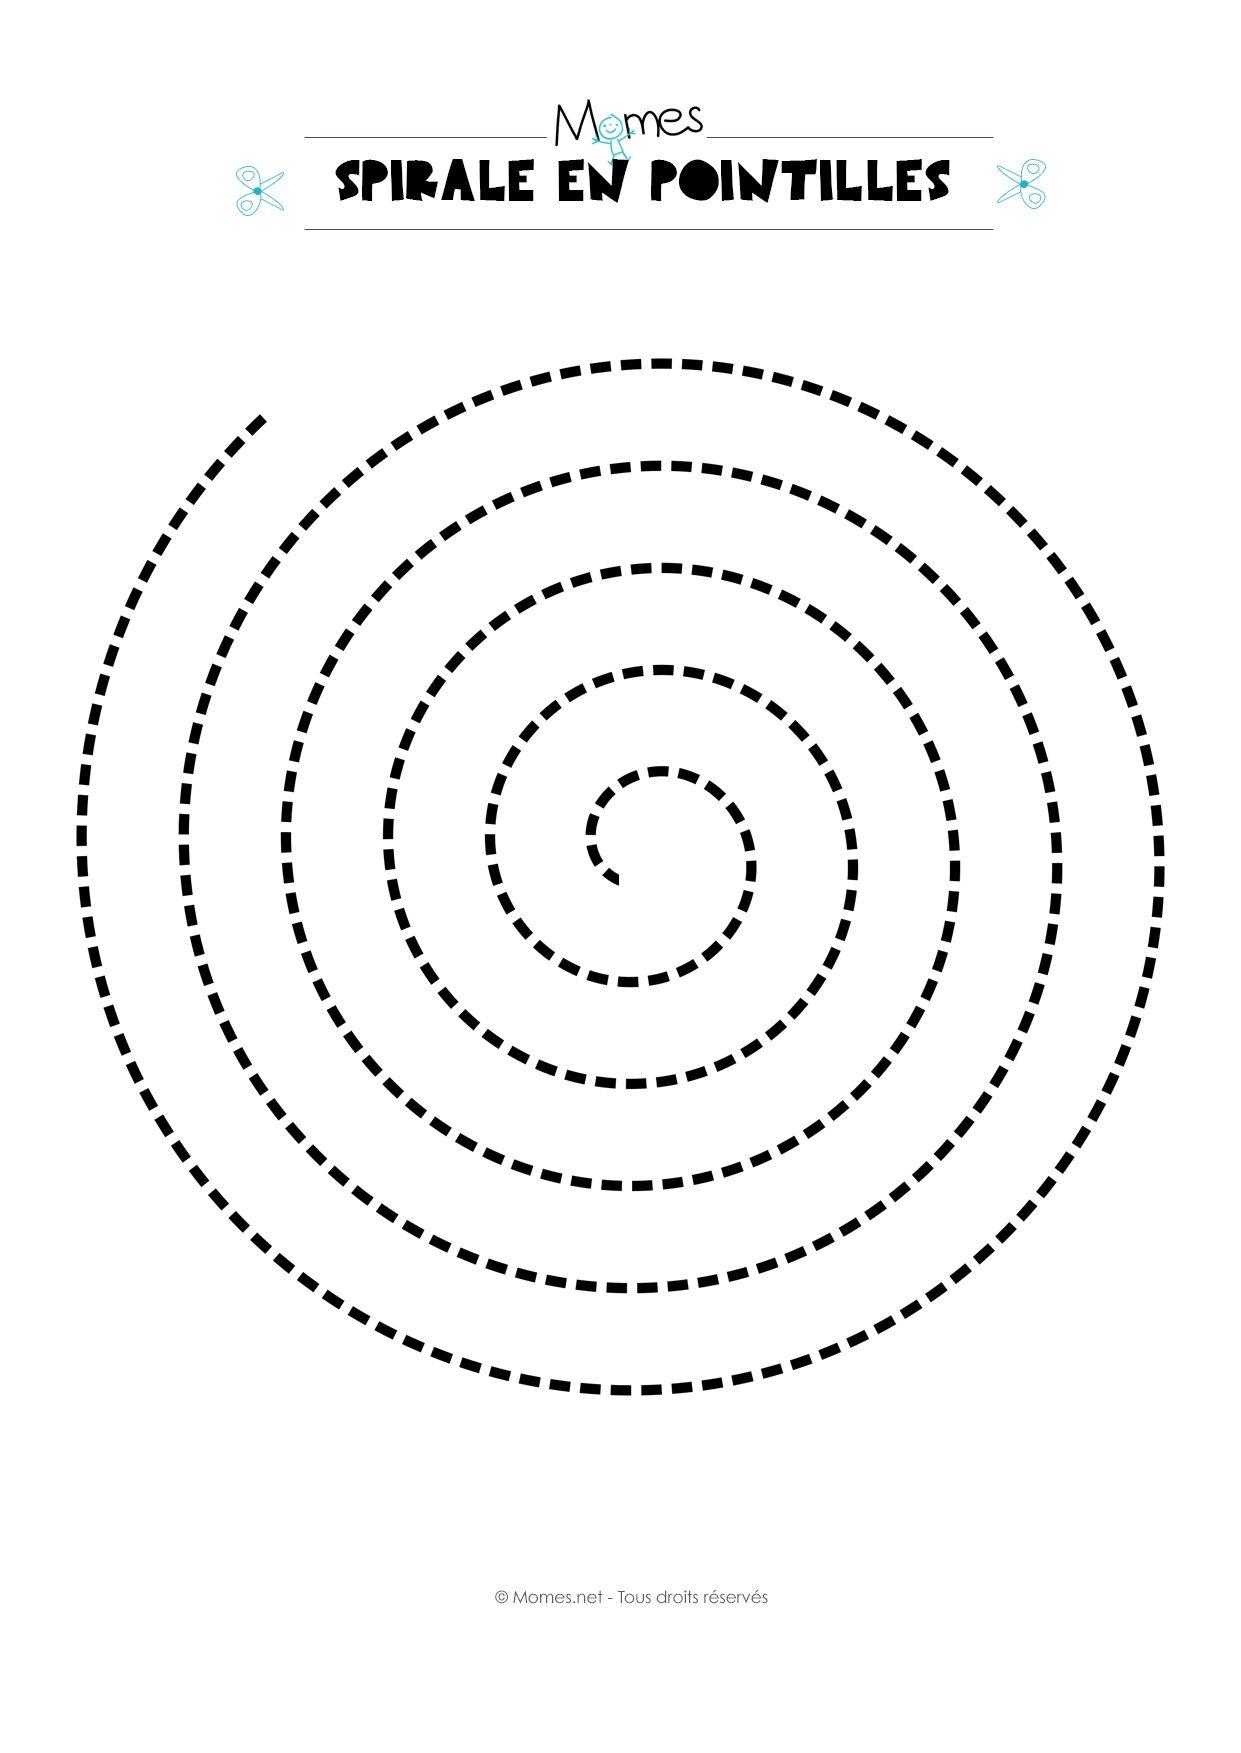 Modèle de spirale en pointillés | Pinterest | Cutting activities ...